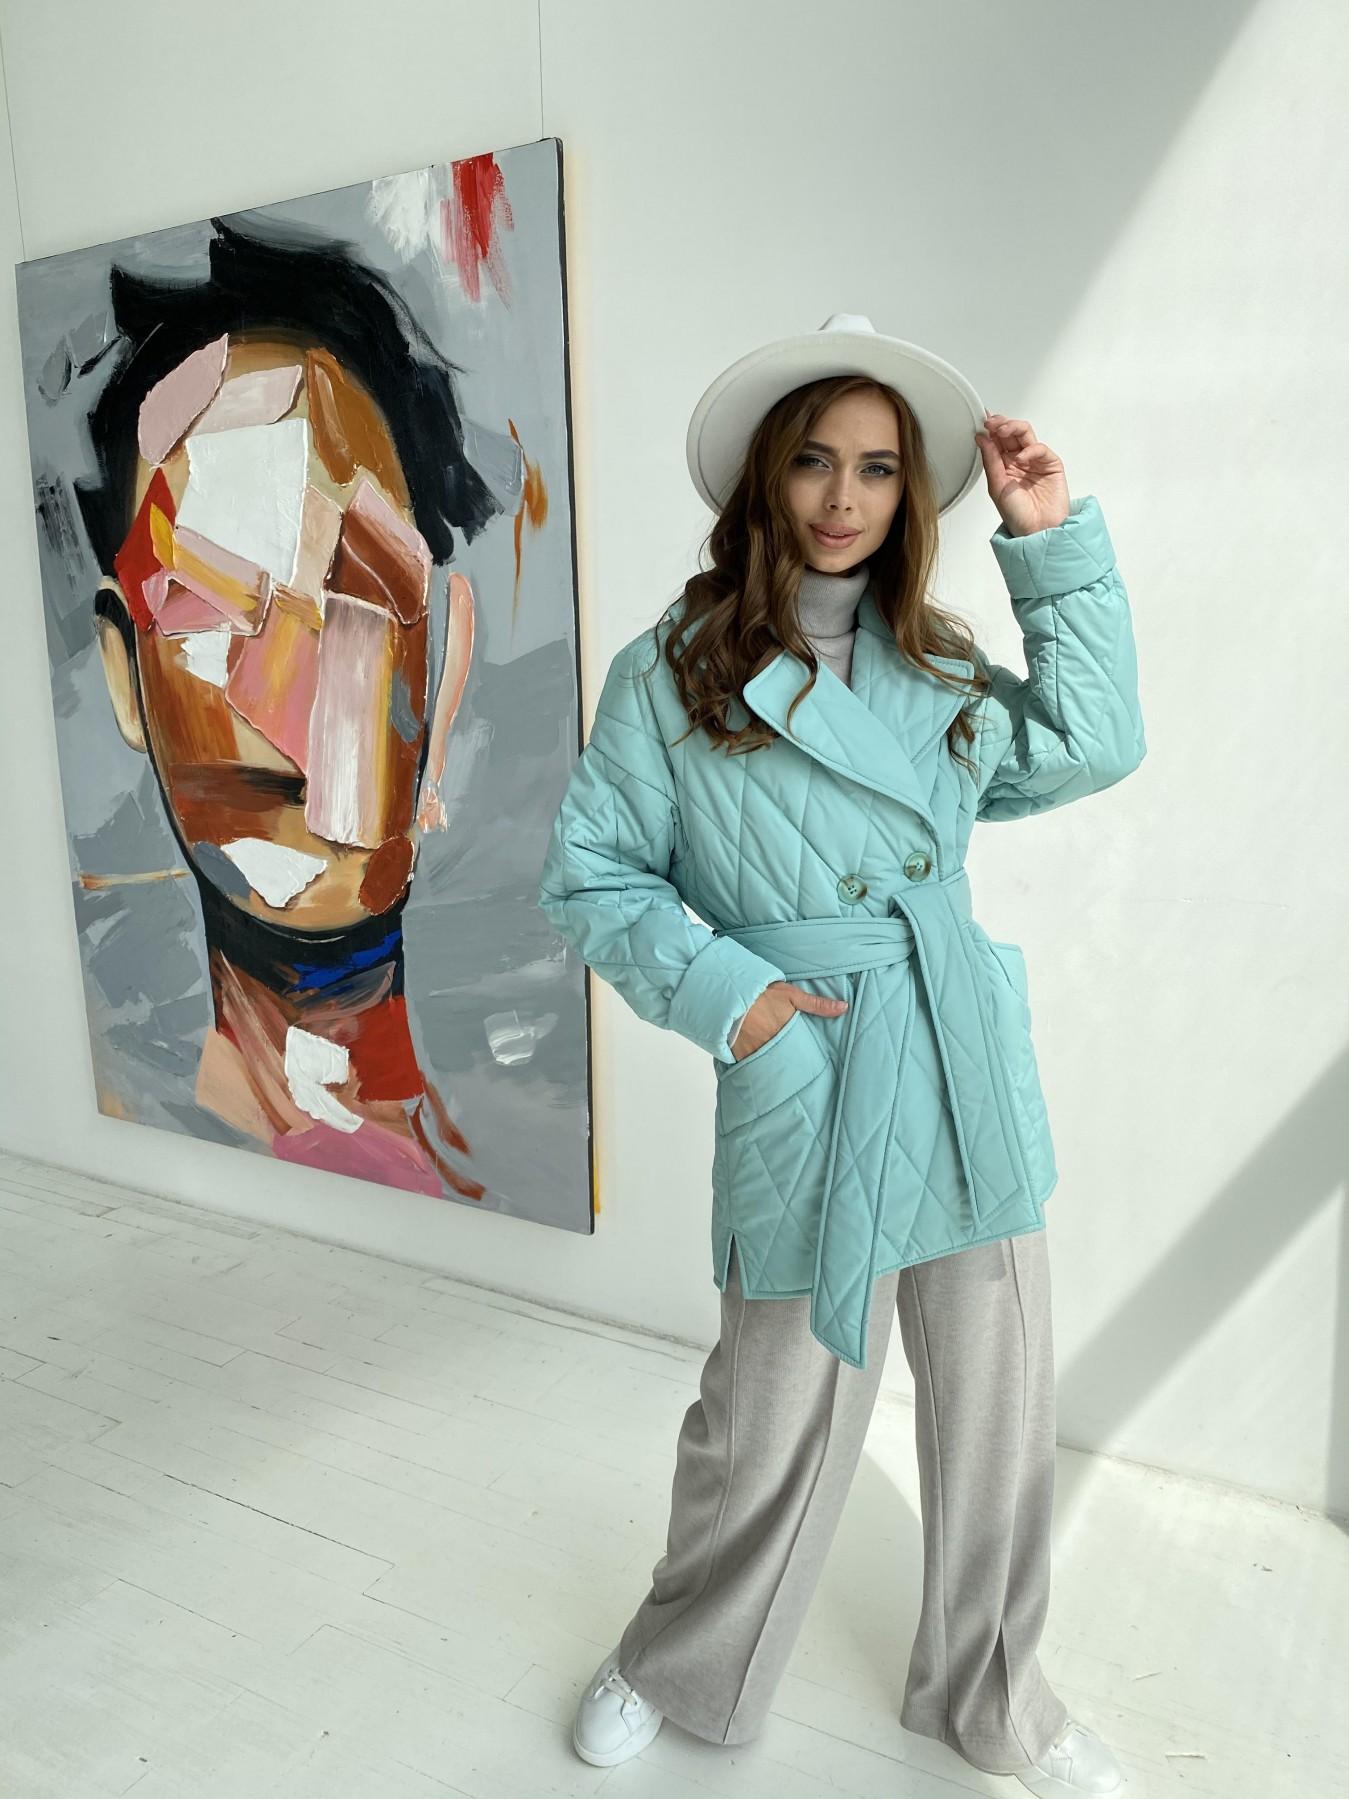 Норд стеганая куртка из плащеки 11770  АРТ. 48511 Цвет: Олива 2 - фото 7, интернет магазин tm-modus.ru